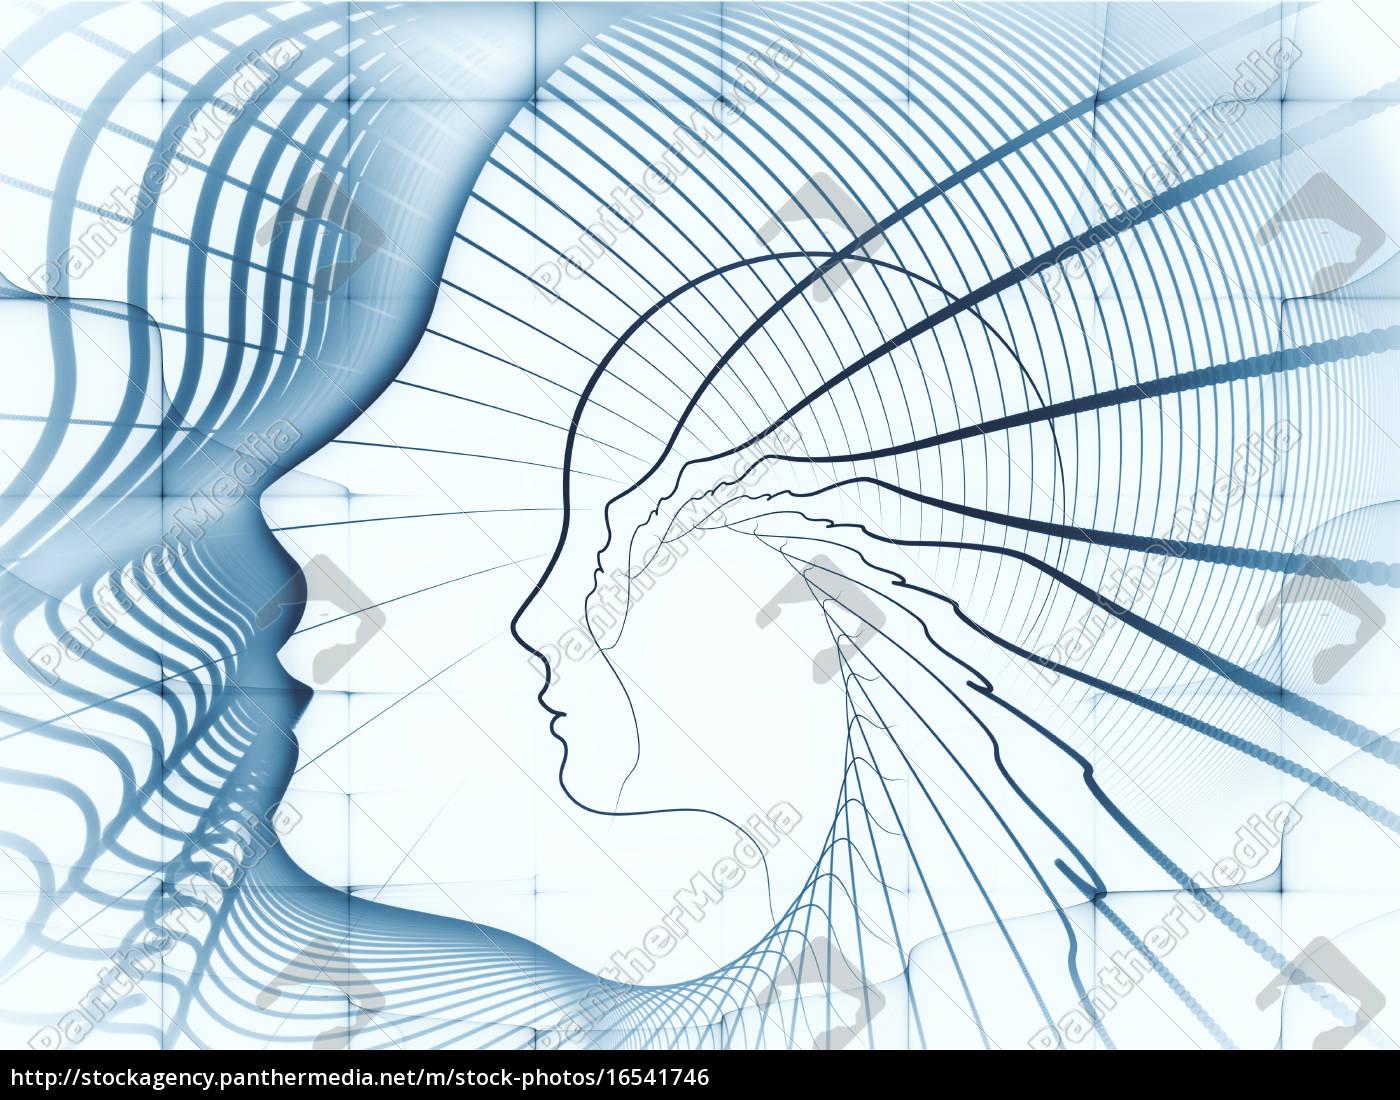 in, search, of, soul, geometry - 16541746